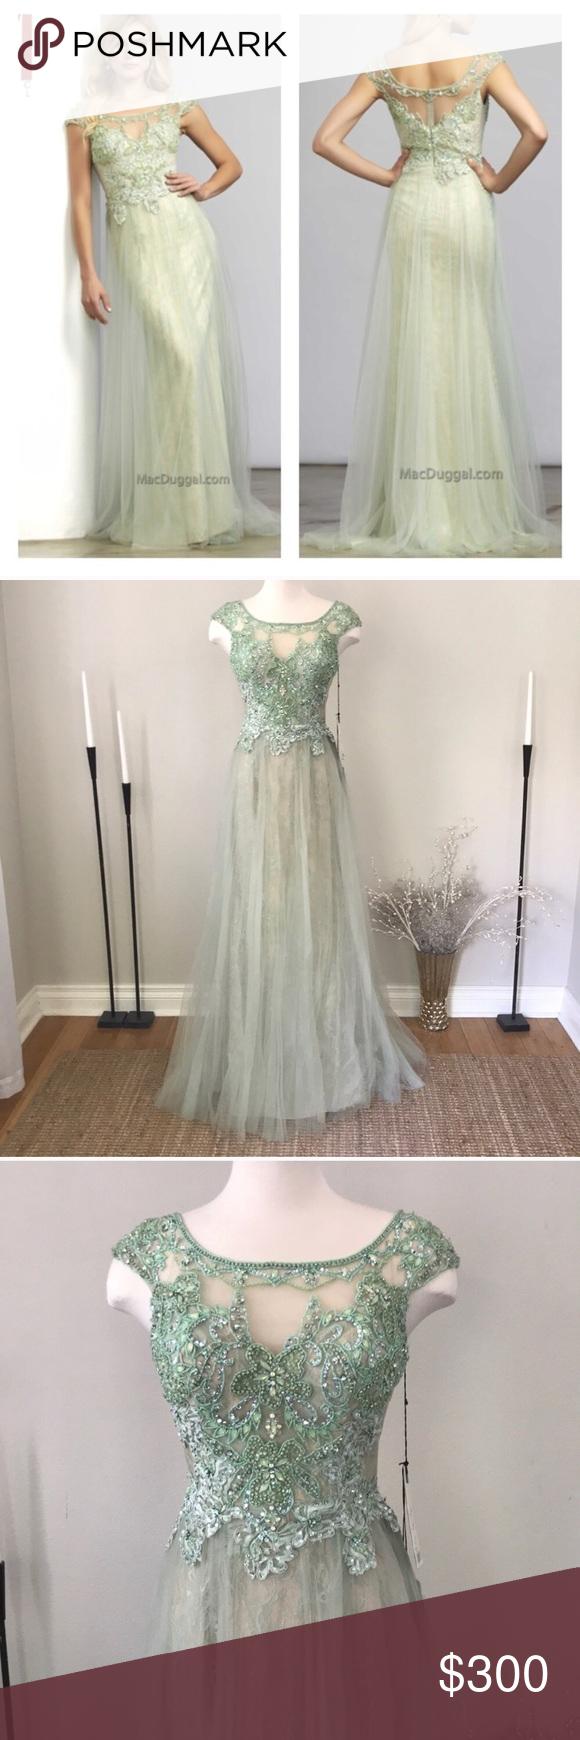 Lace wedding dress under 300  Mac Duggal green lace beaded dress NWT NWT  My Posh Closet